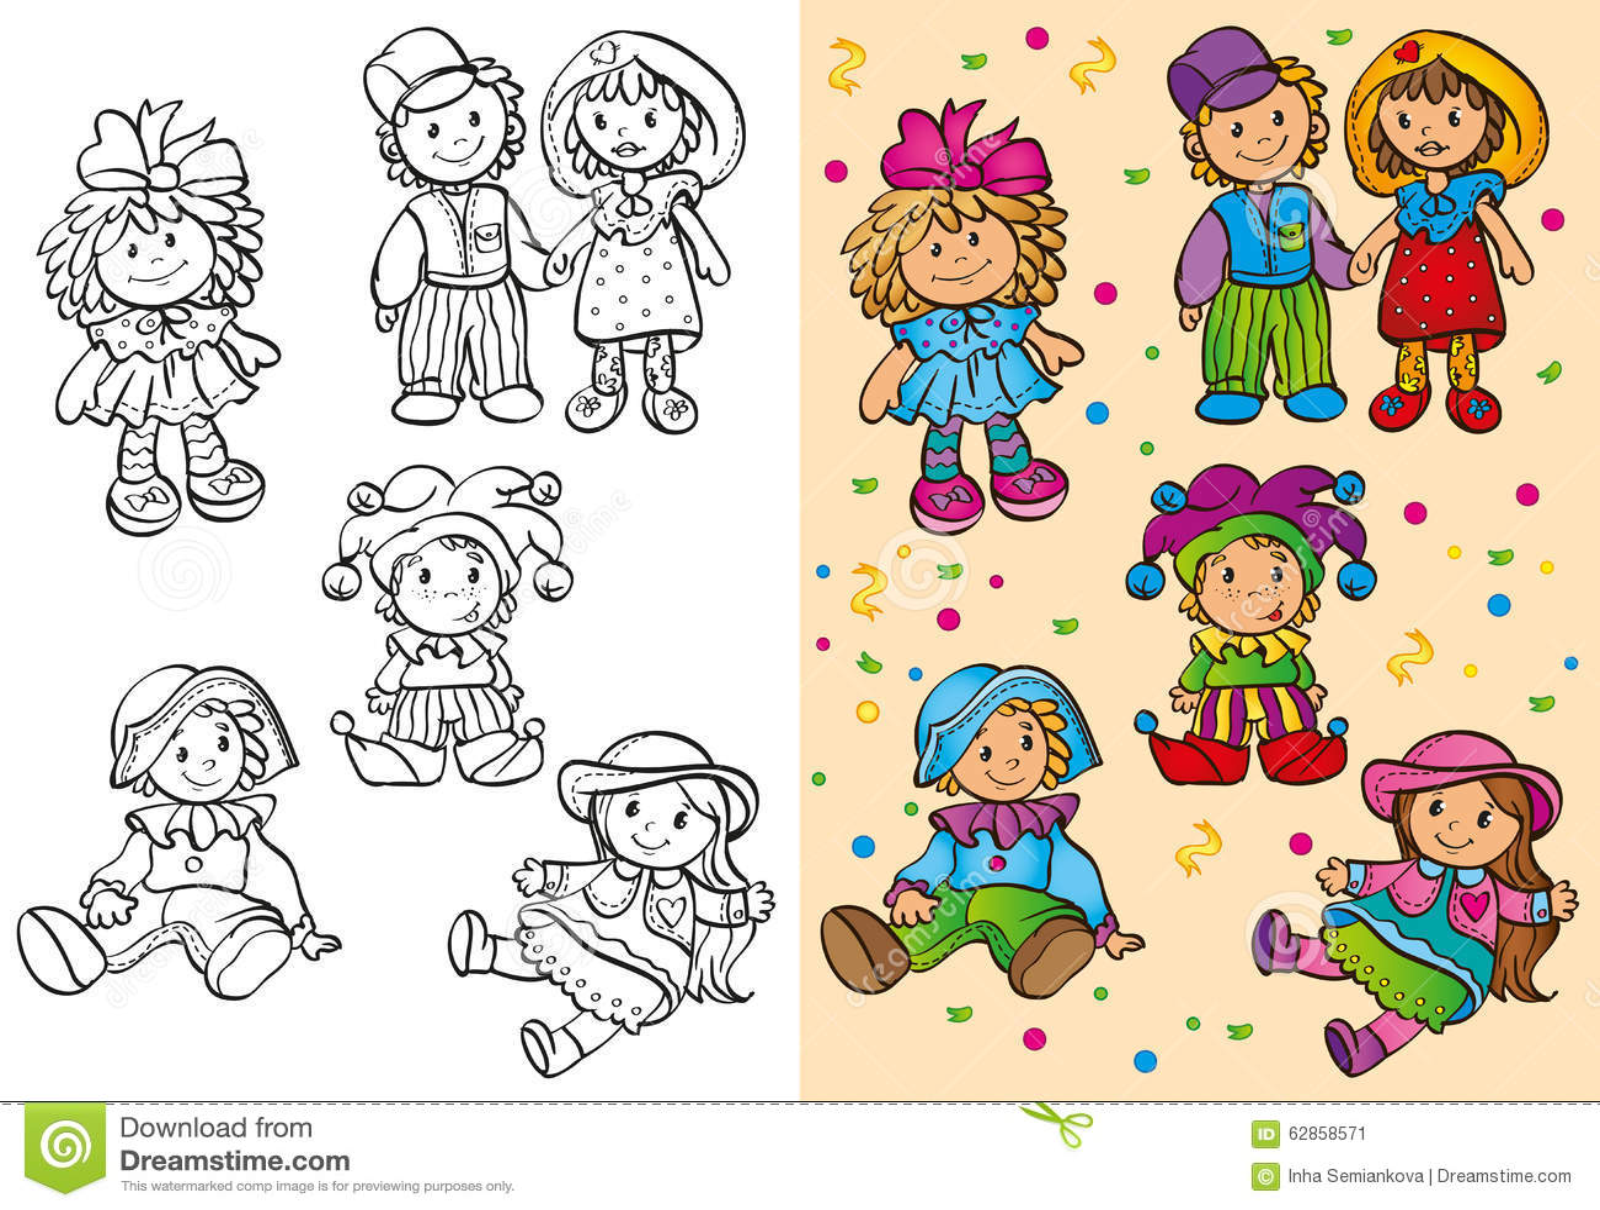 Livro Para Colorir De Bonecas Bonitos Diferentes Ilustracao Stock